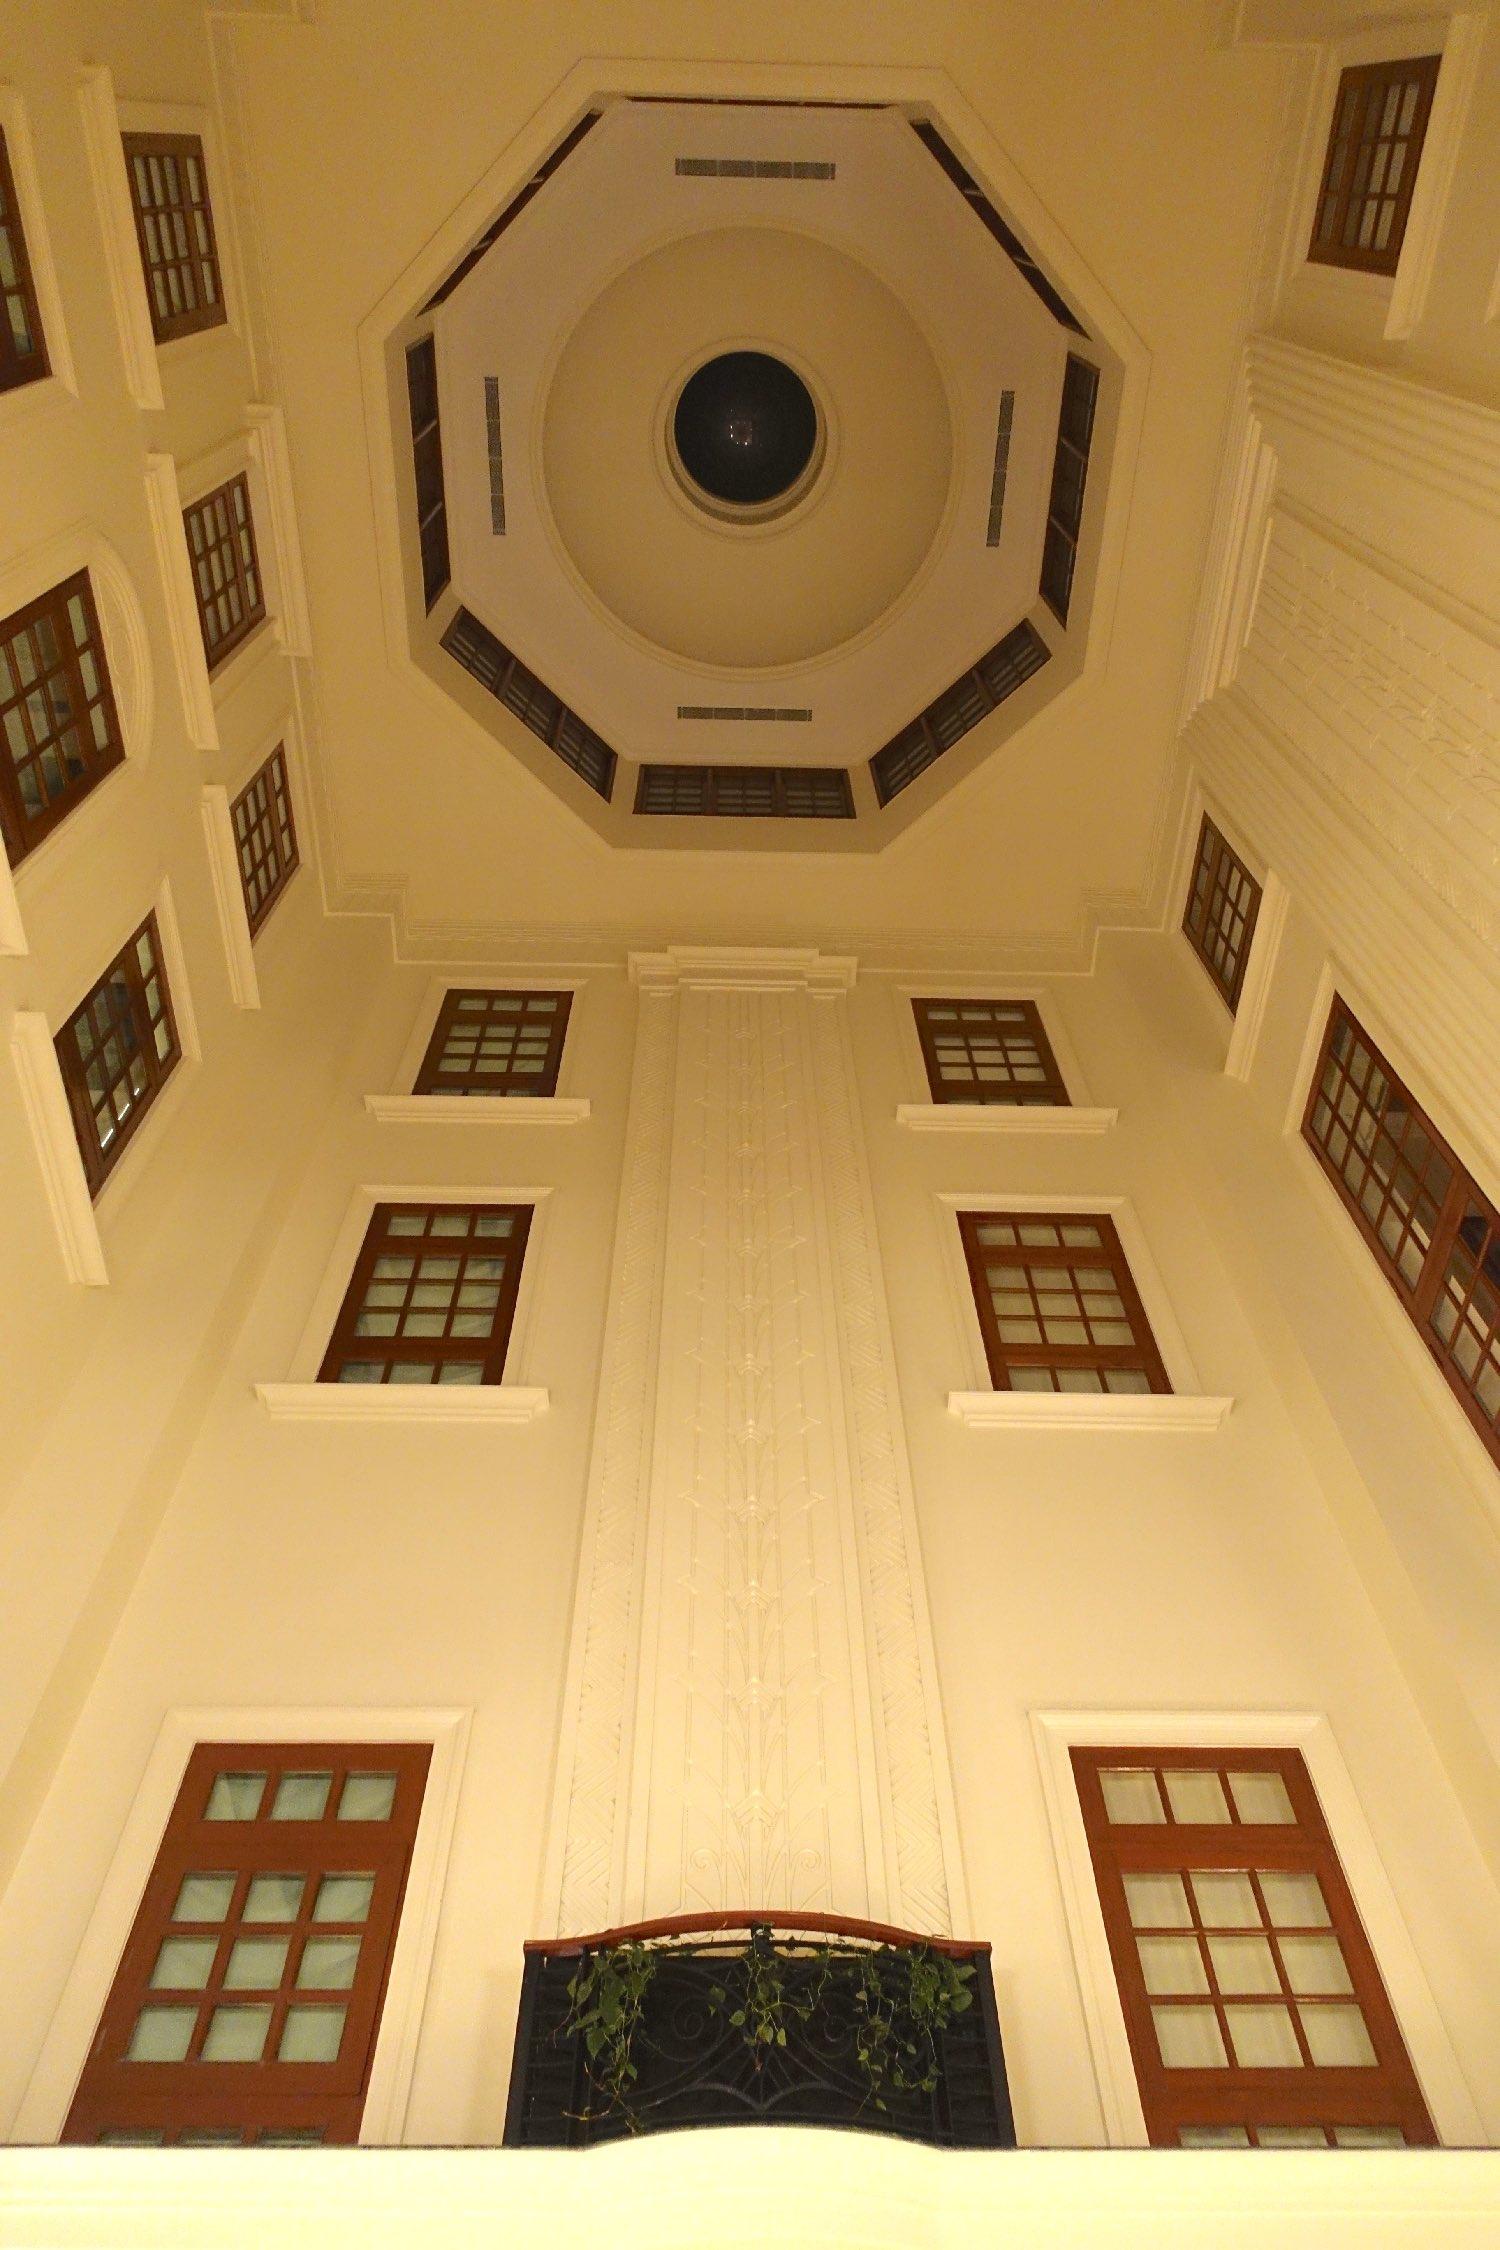 New Delhi | The Imperial Hotel | The Imperial New Delhi | Living | Art deco architecture | Taj group | ©sandrine cohen